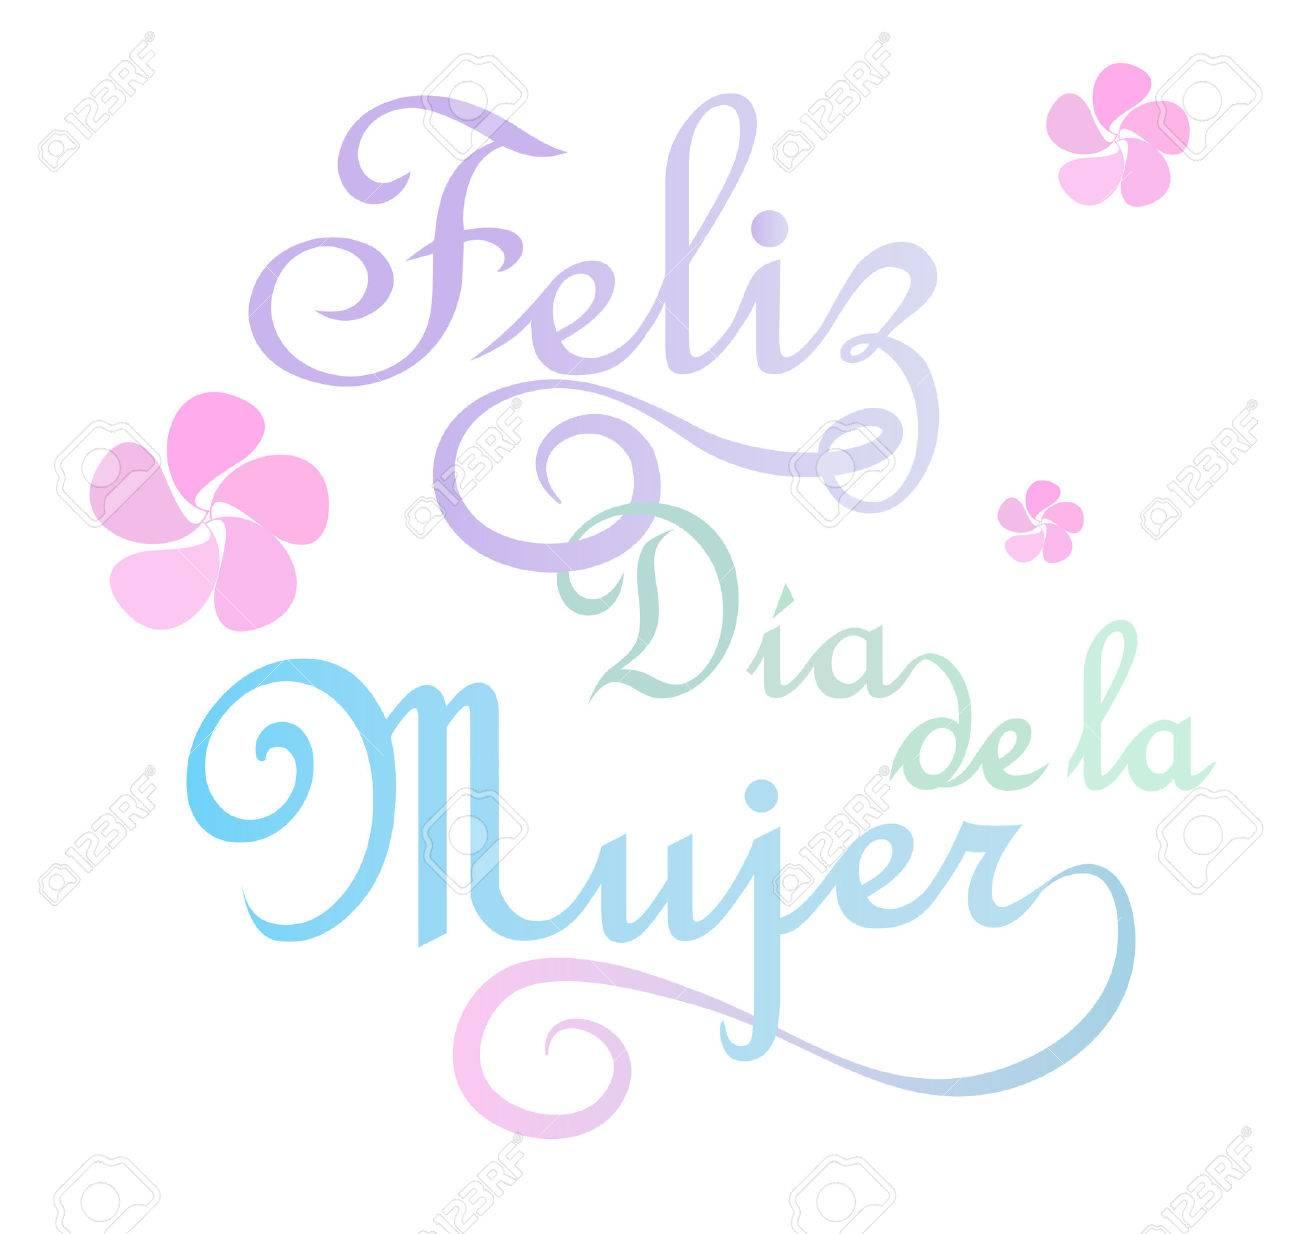 Feliz Dia De La Mujer Ist Glücklich Frauen S Tag In Spanischer